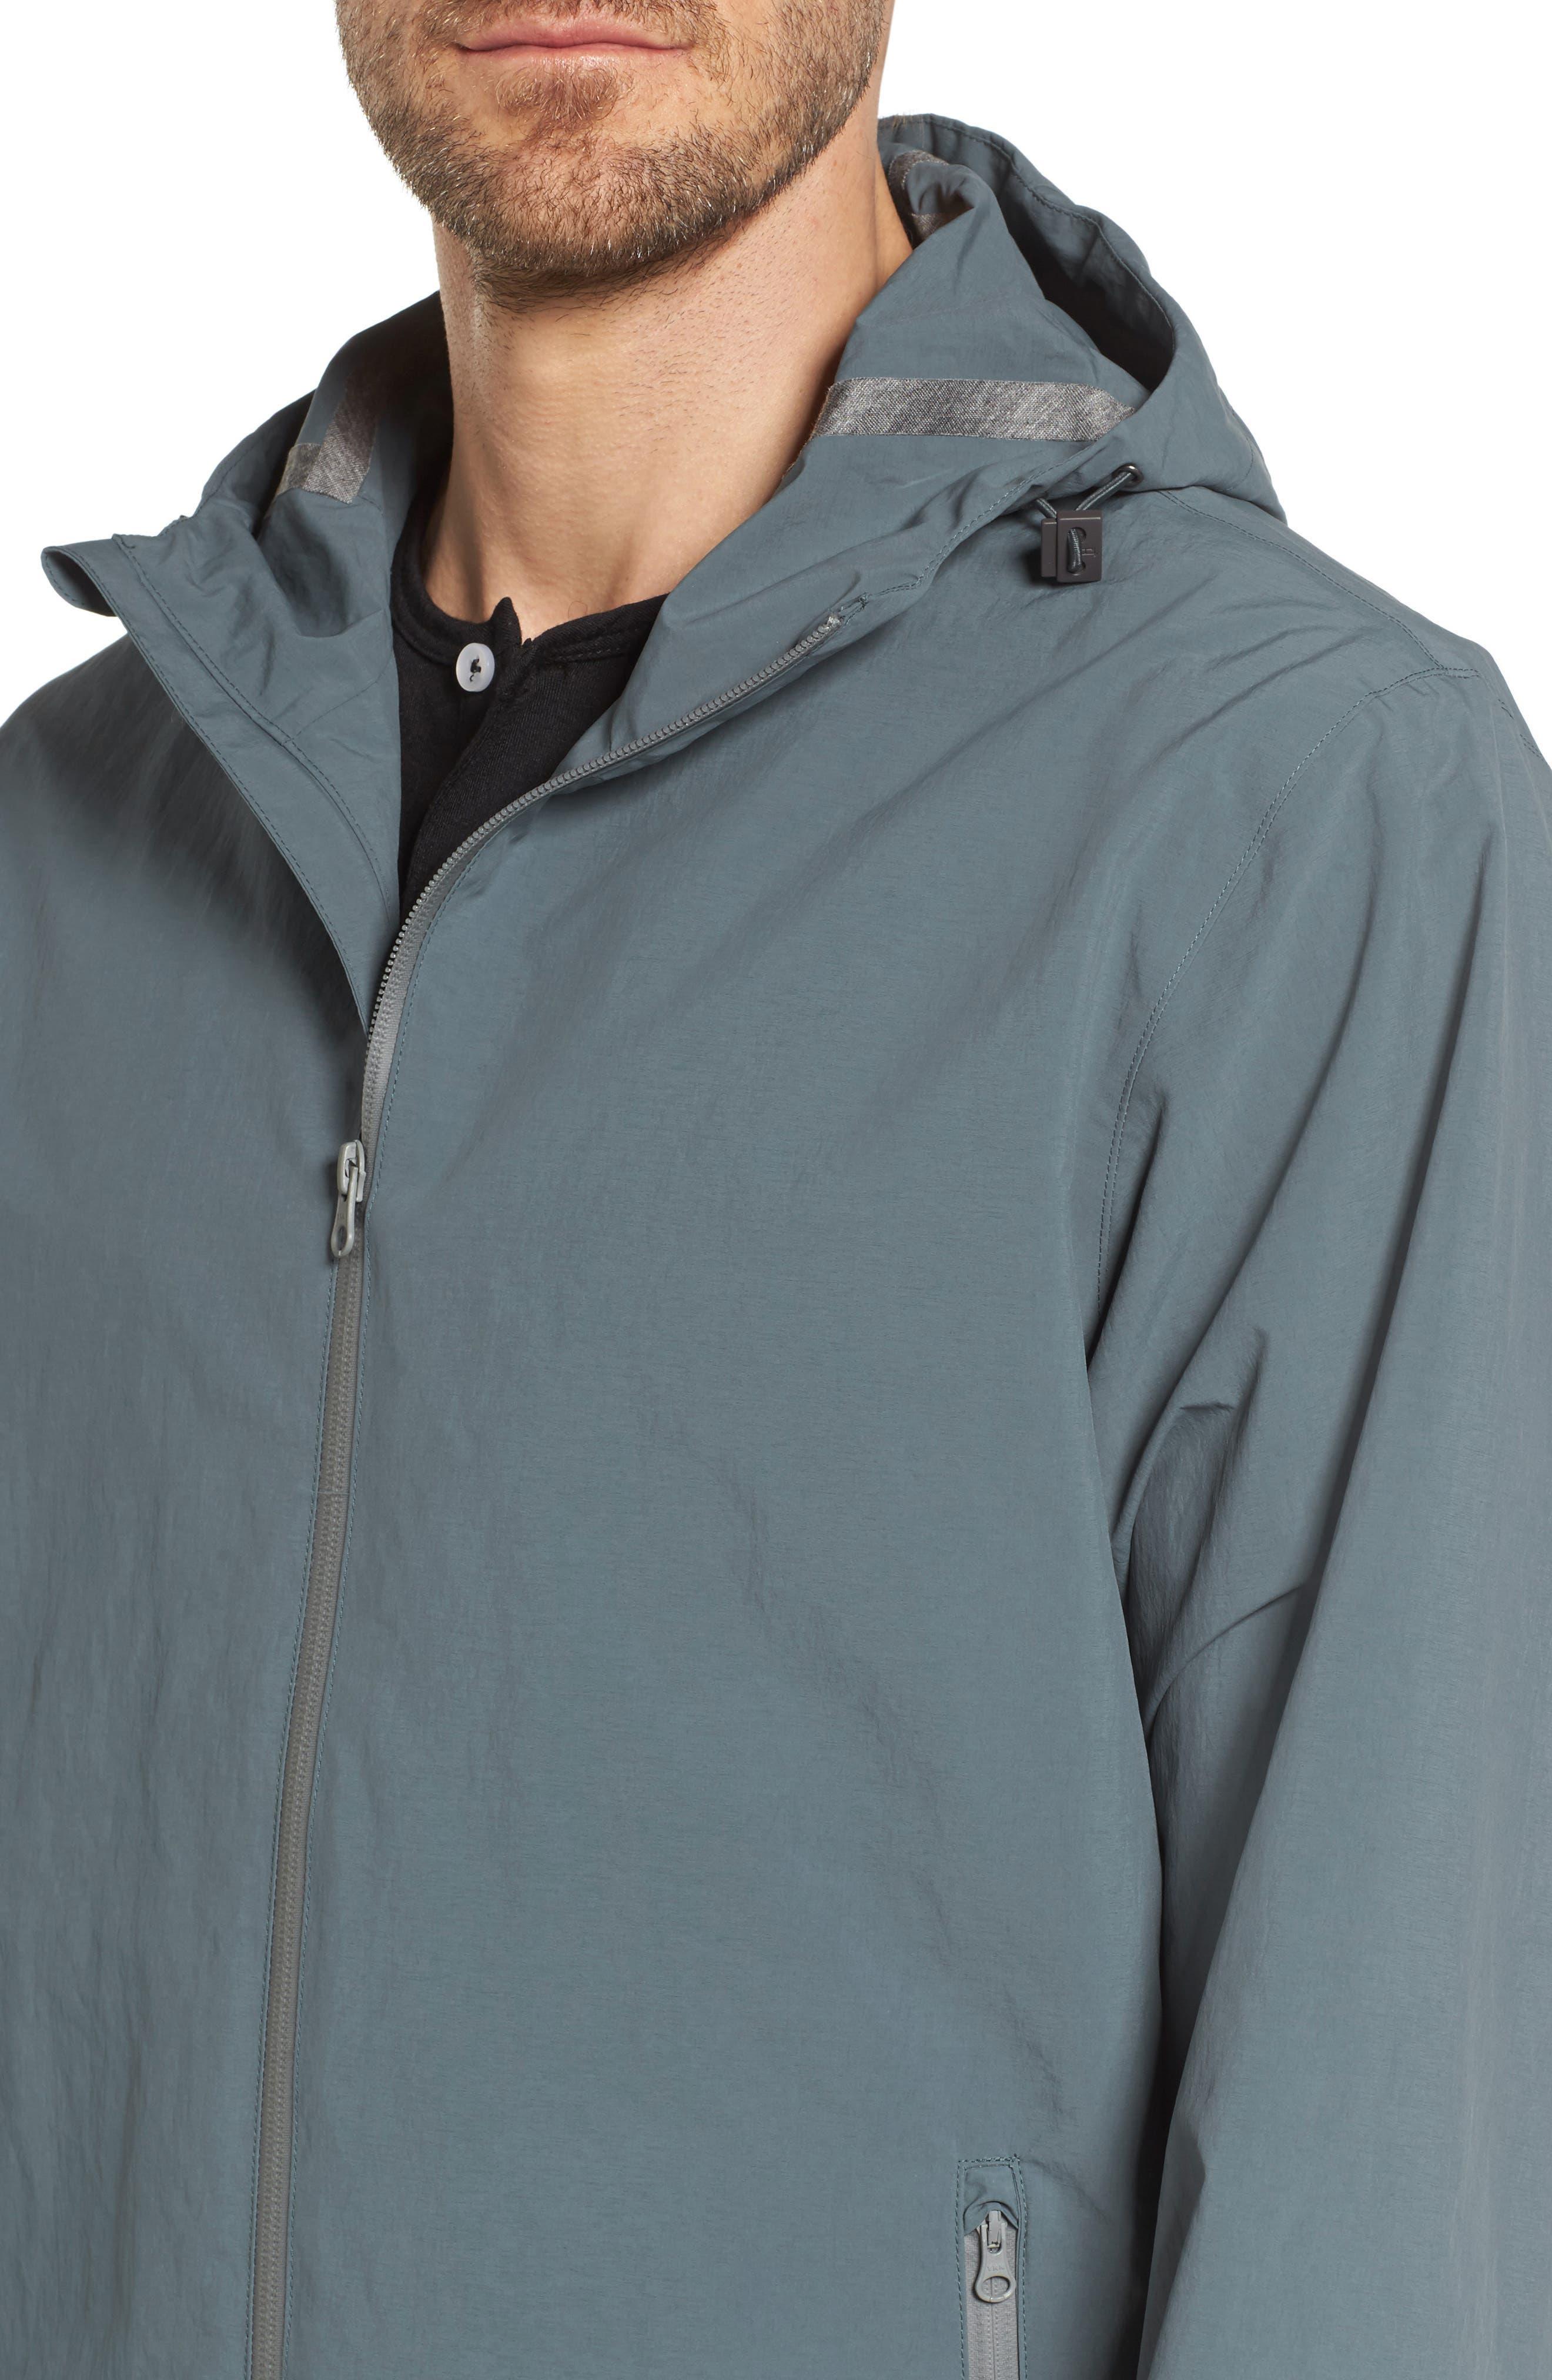 Plaster Hooded Raincoat,                             Alternate thumbnail 4, color,                             Blue/ Grey